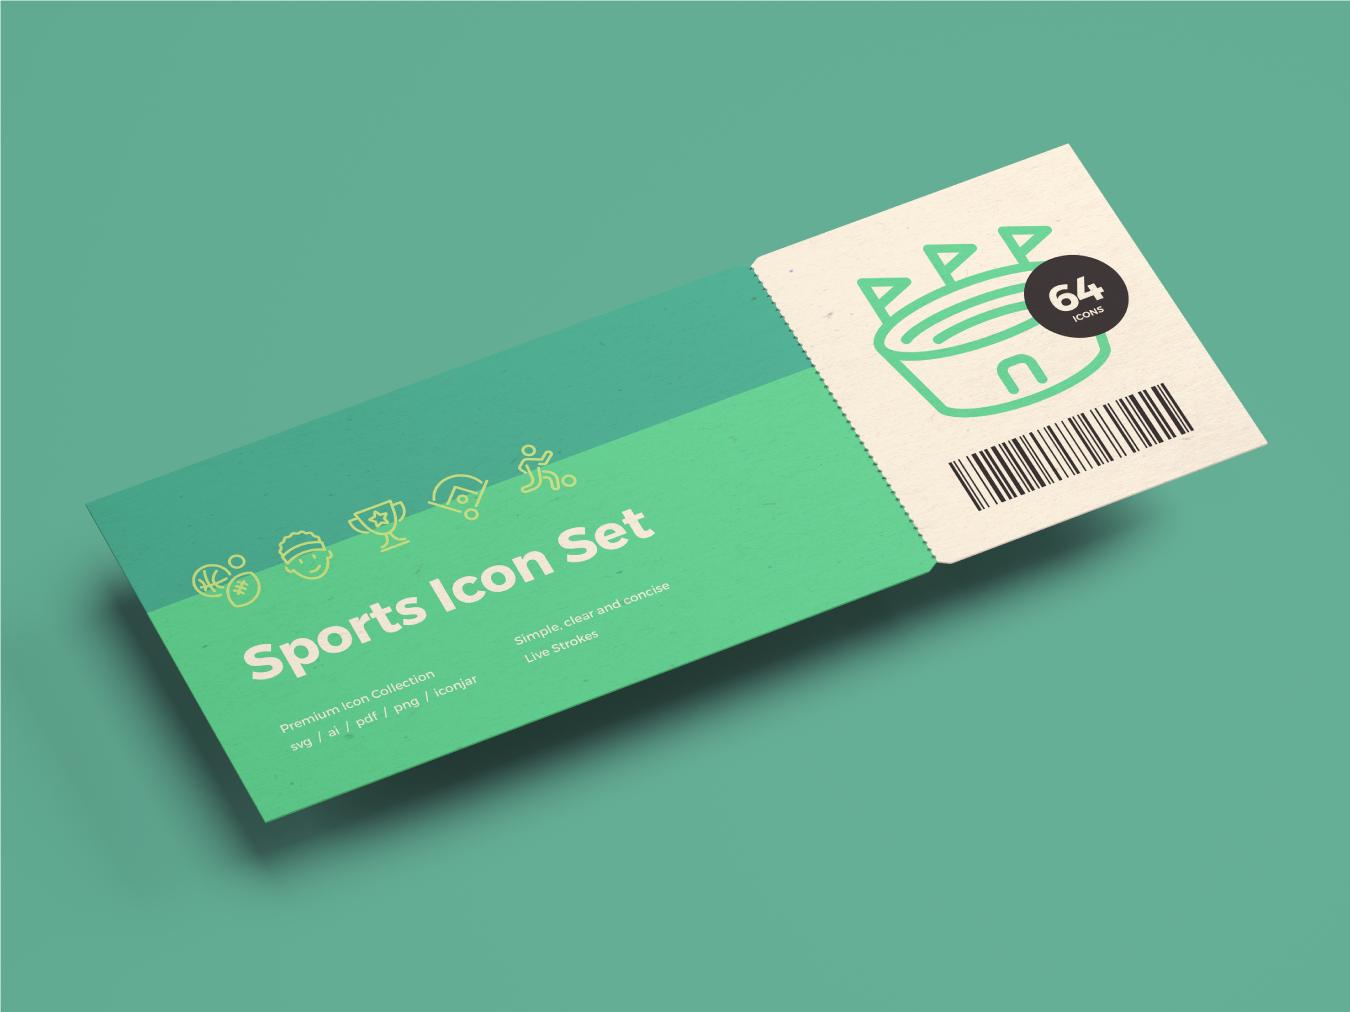 Sports Icons sports ticket illustration design vector icon ui icons icon set